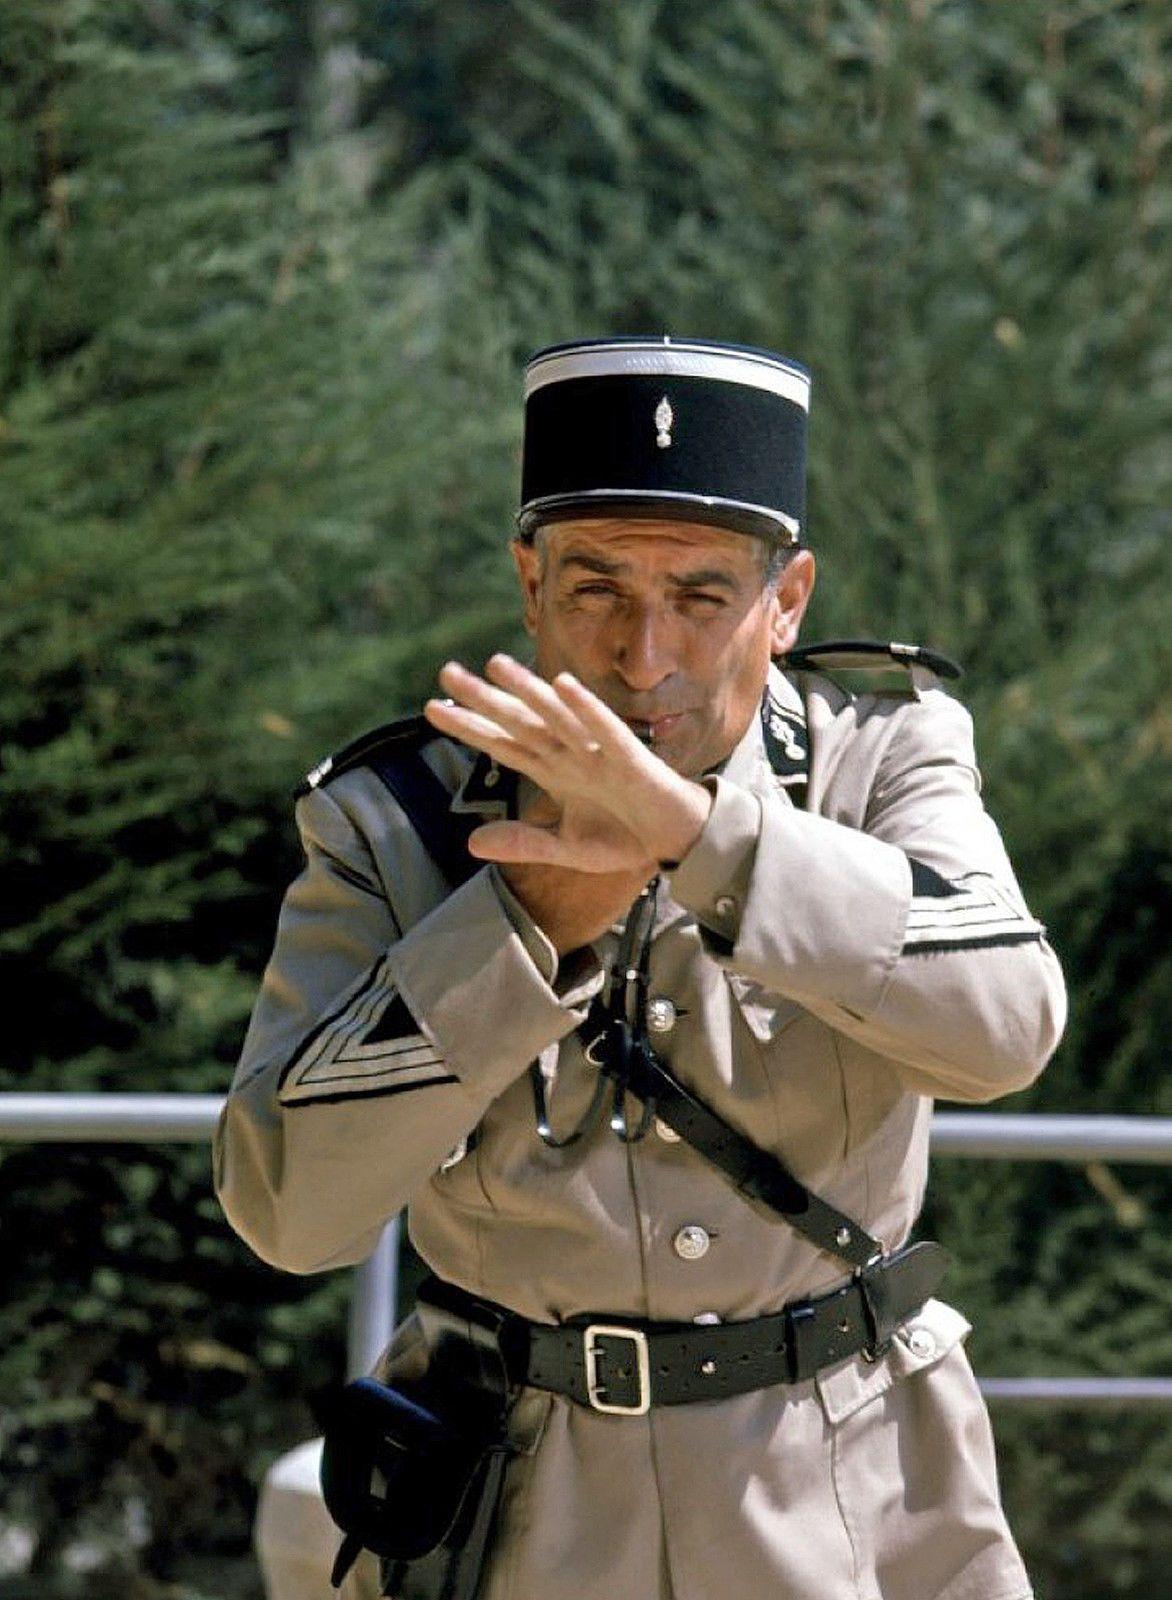 11x15 cm #56 Foto der Gendarme von Marie Louis De Funes Guy Grosso